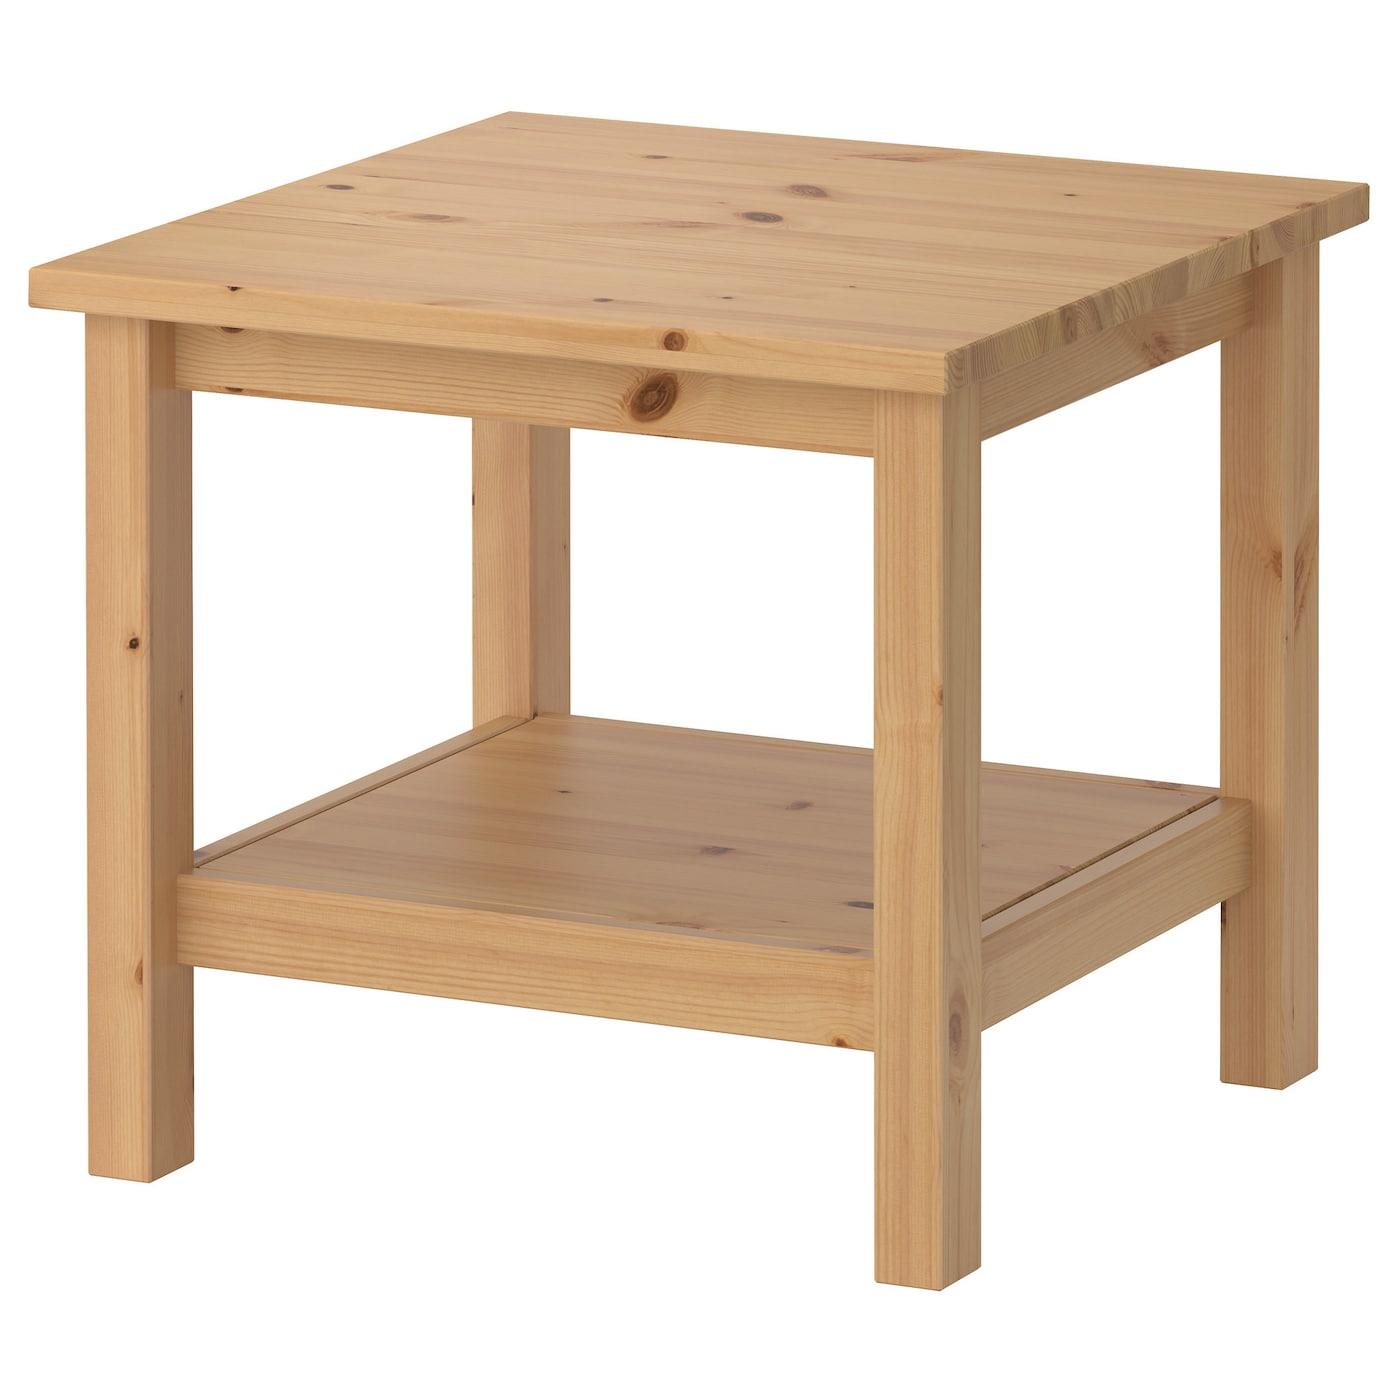 Hemnes side table light brown 55x55 cm ikea for Table lit ordinateur ikea